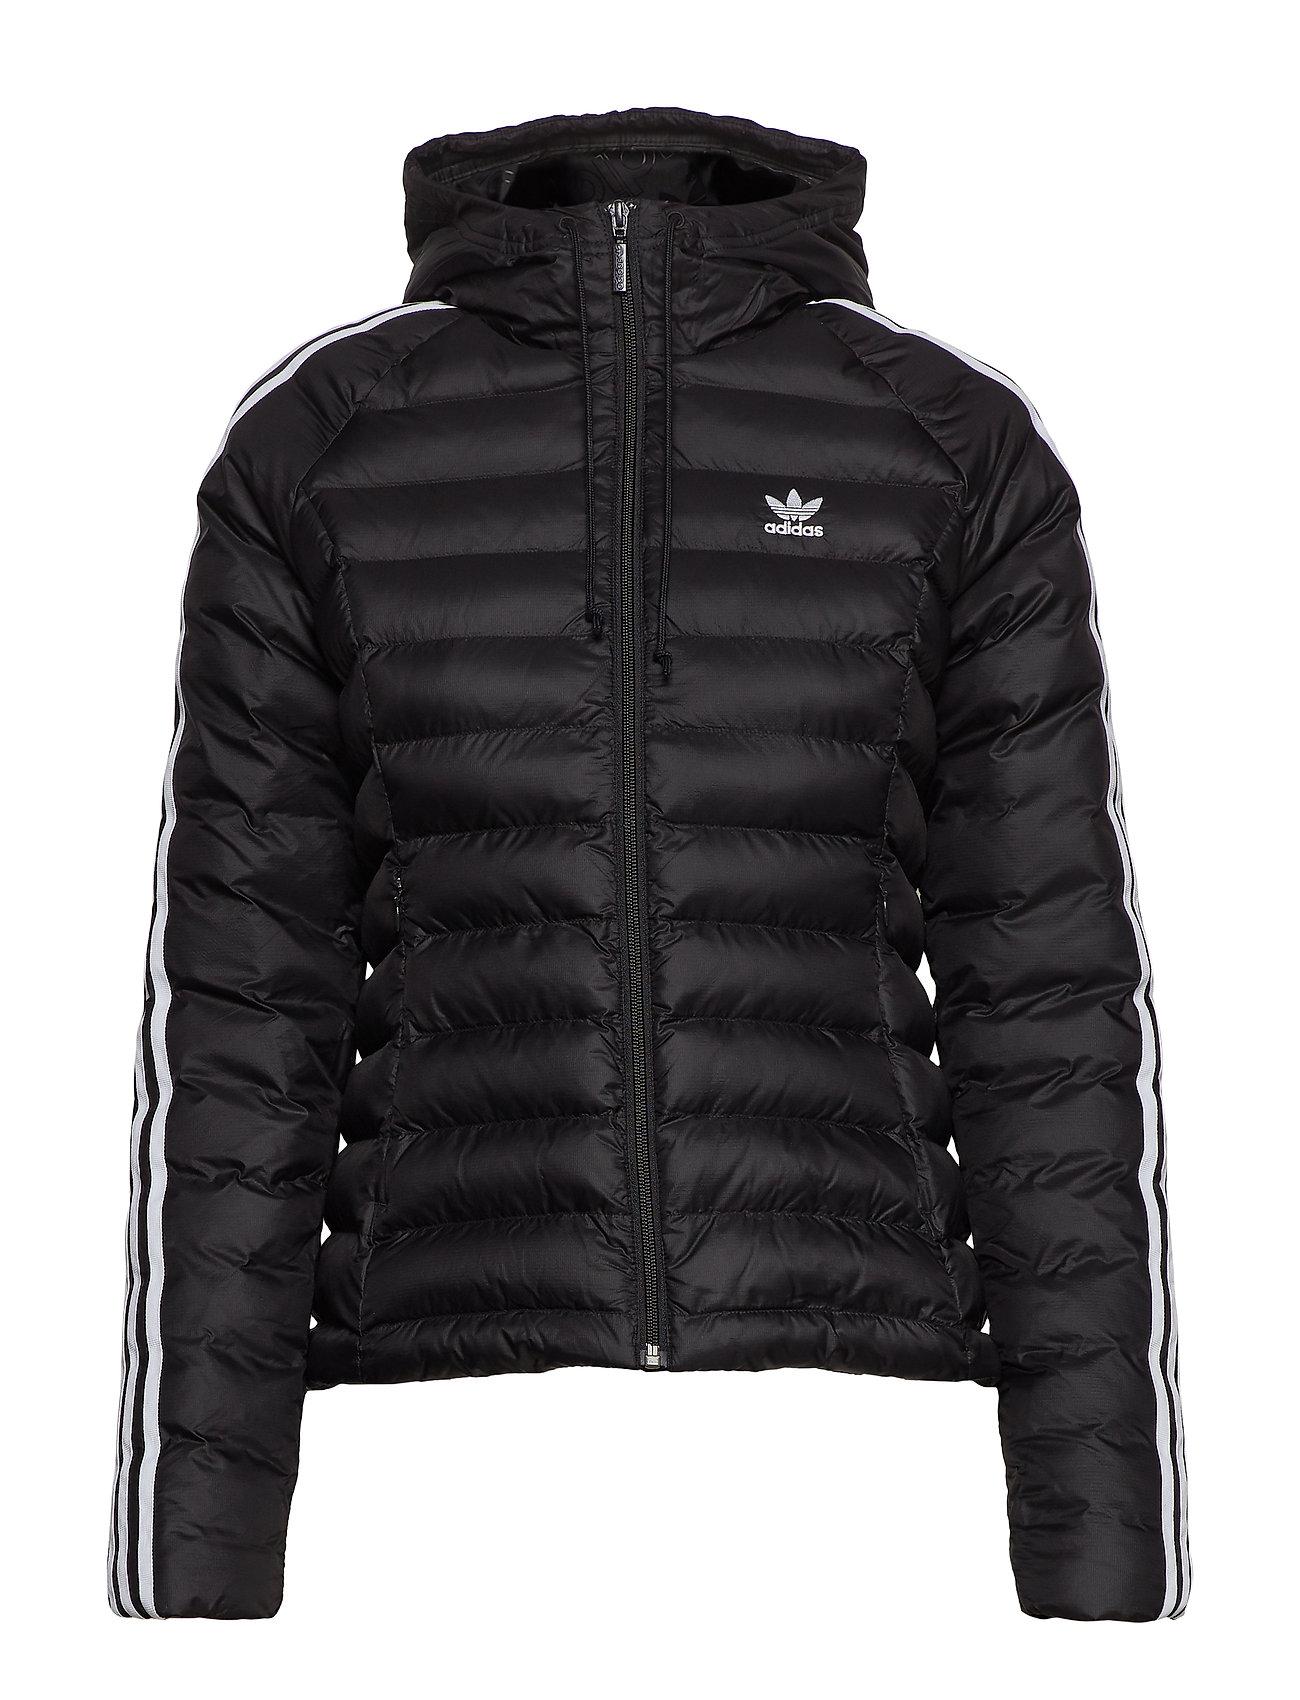 adidas Originals SLIM JACKET - BLACK